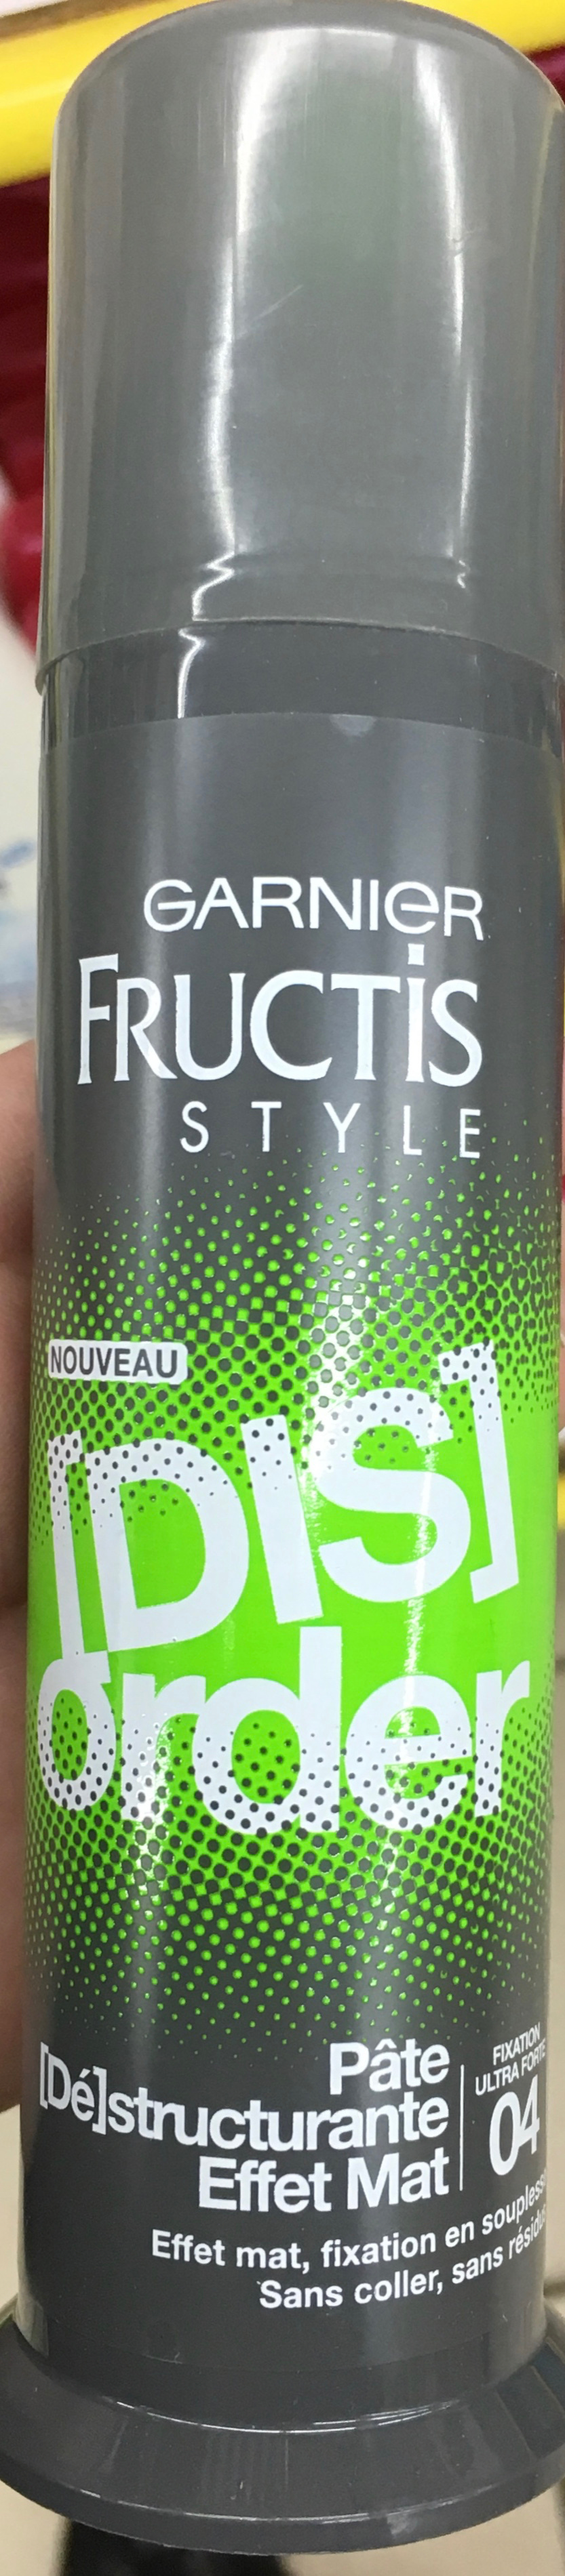 Fructis Style [DIS]order - Produit - fr